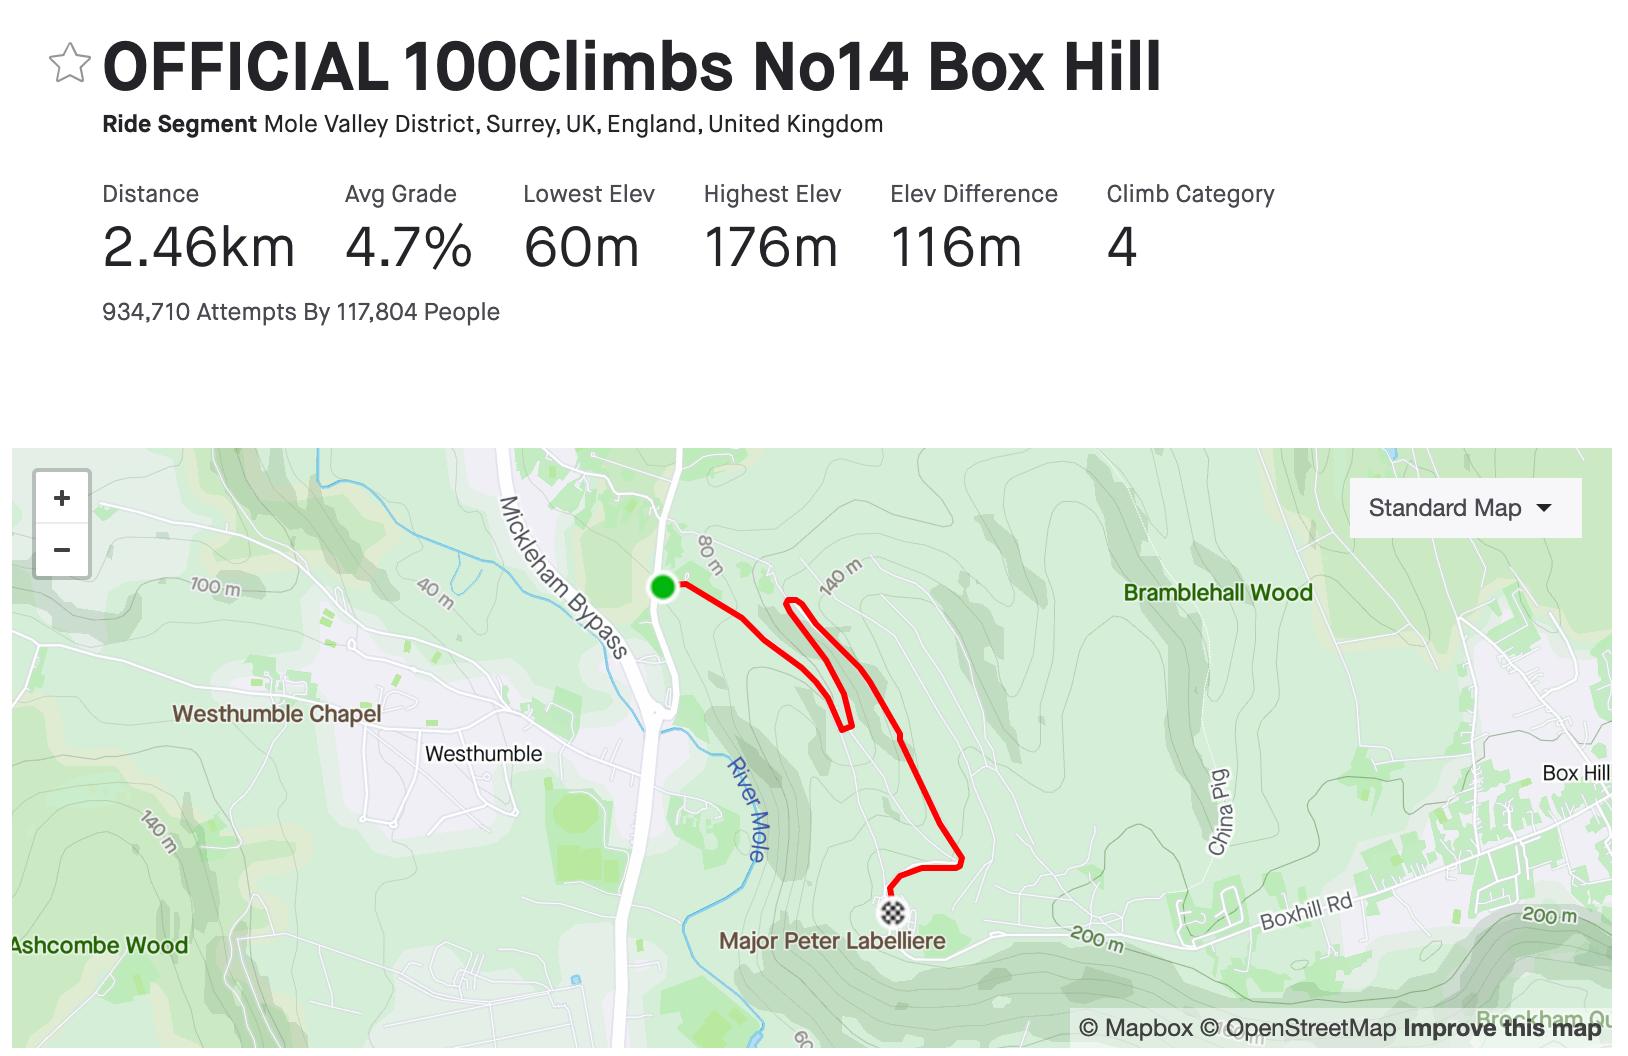 Box hill Strava